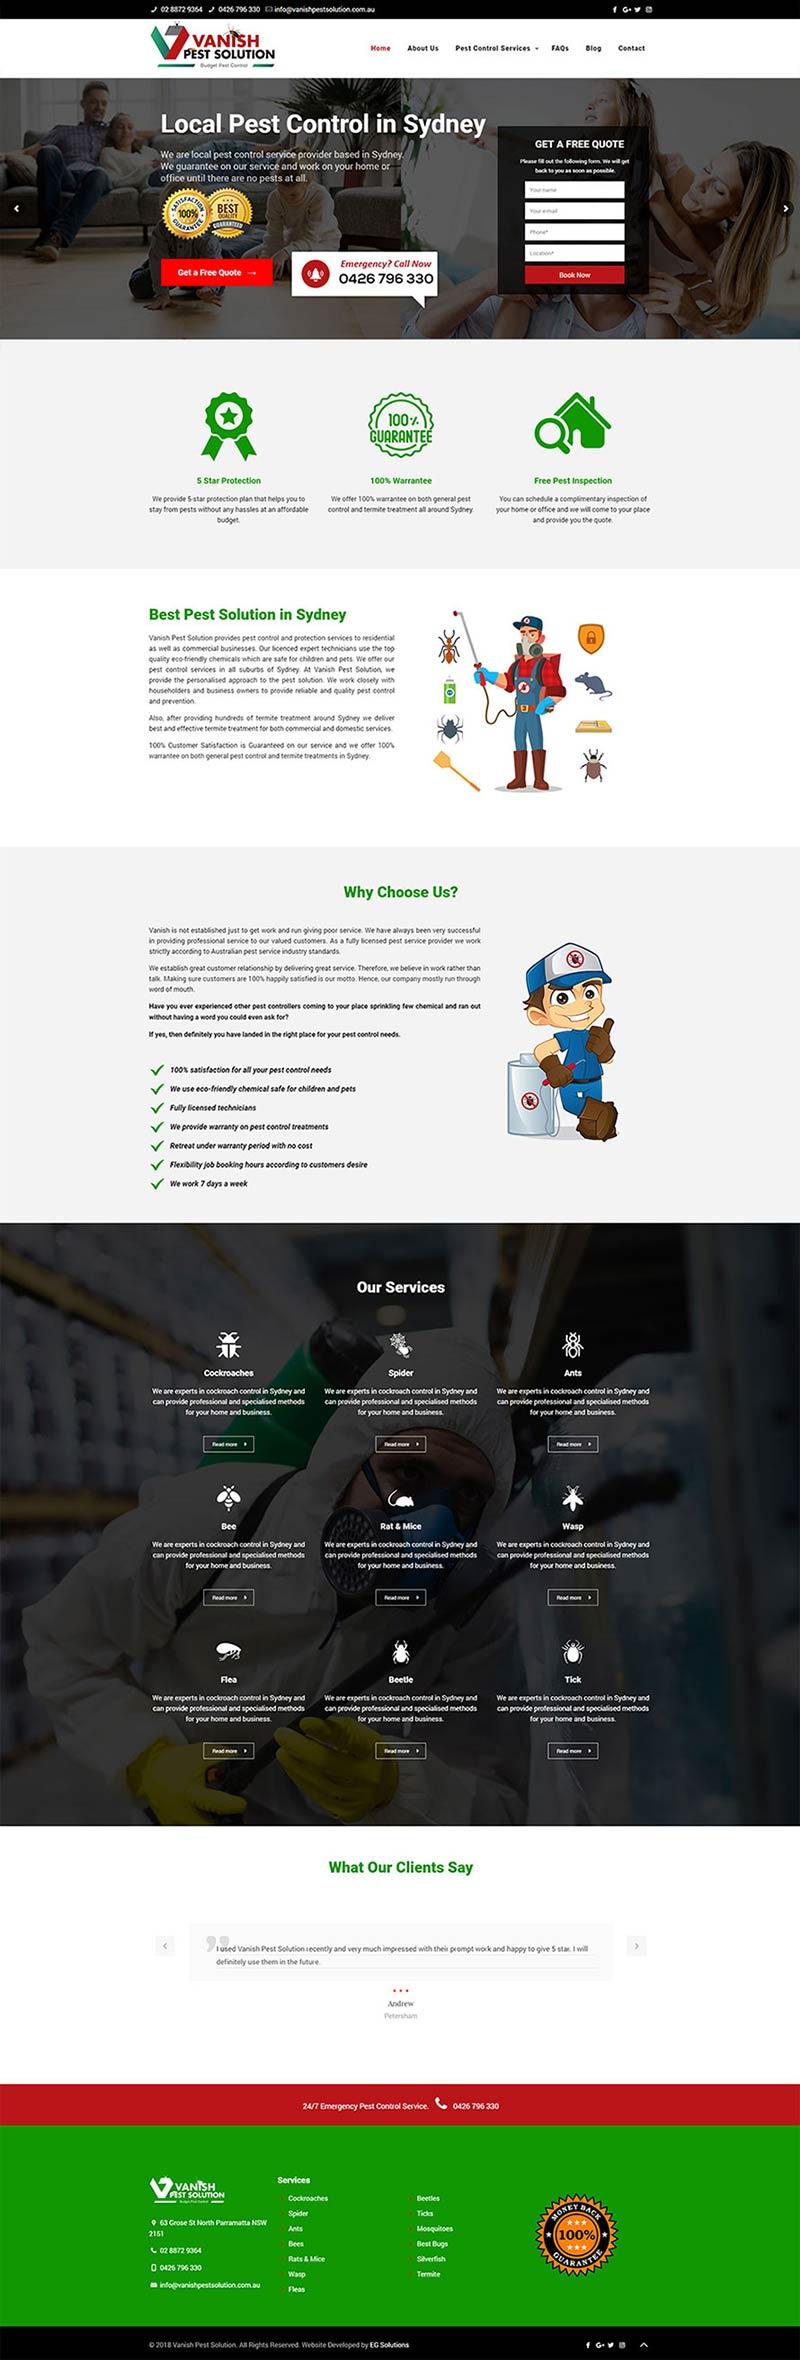 Vanish Pest Solution Homepage Design